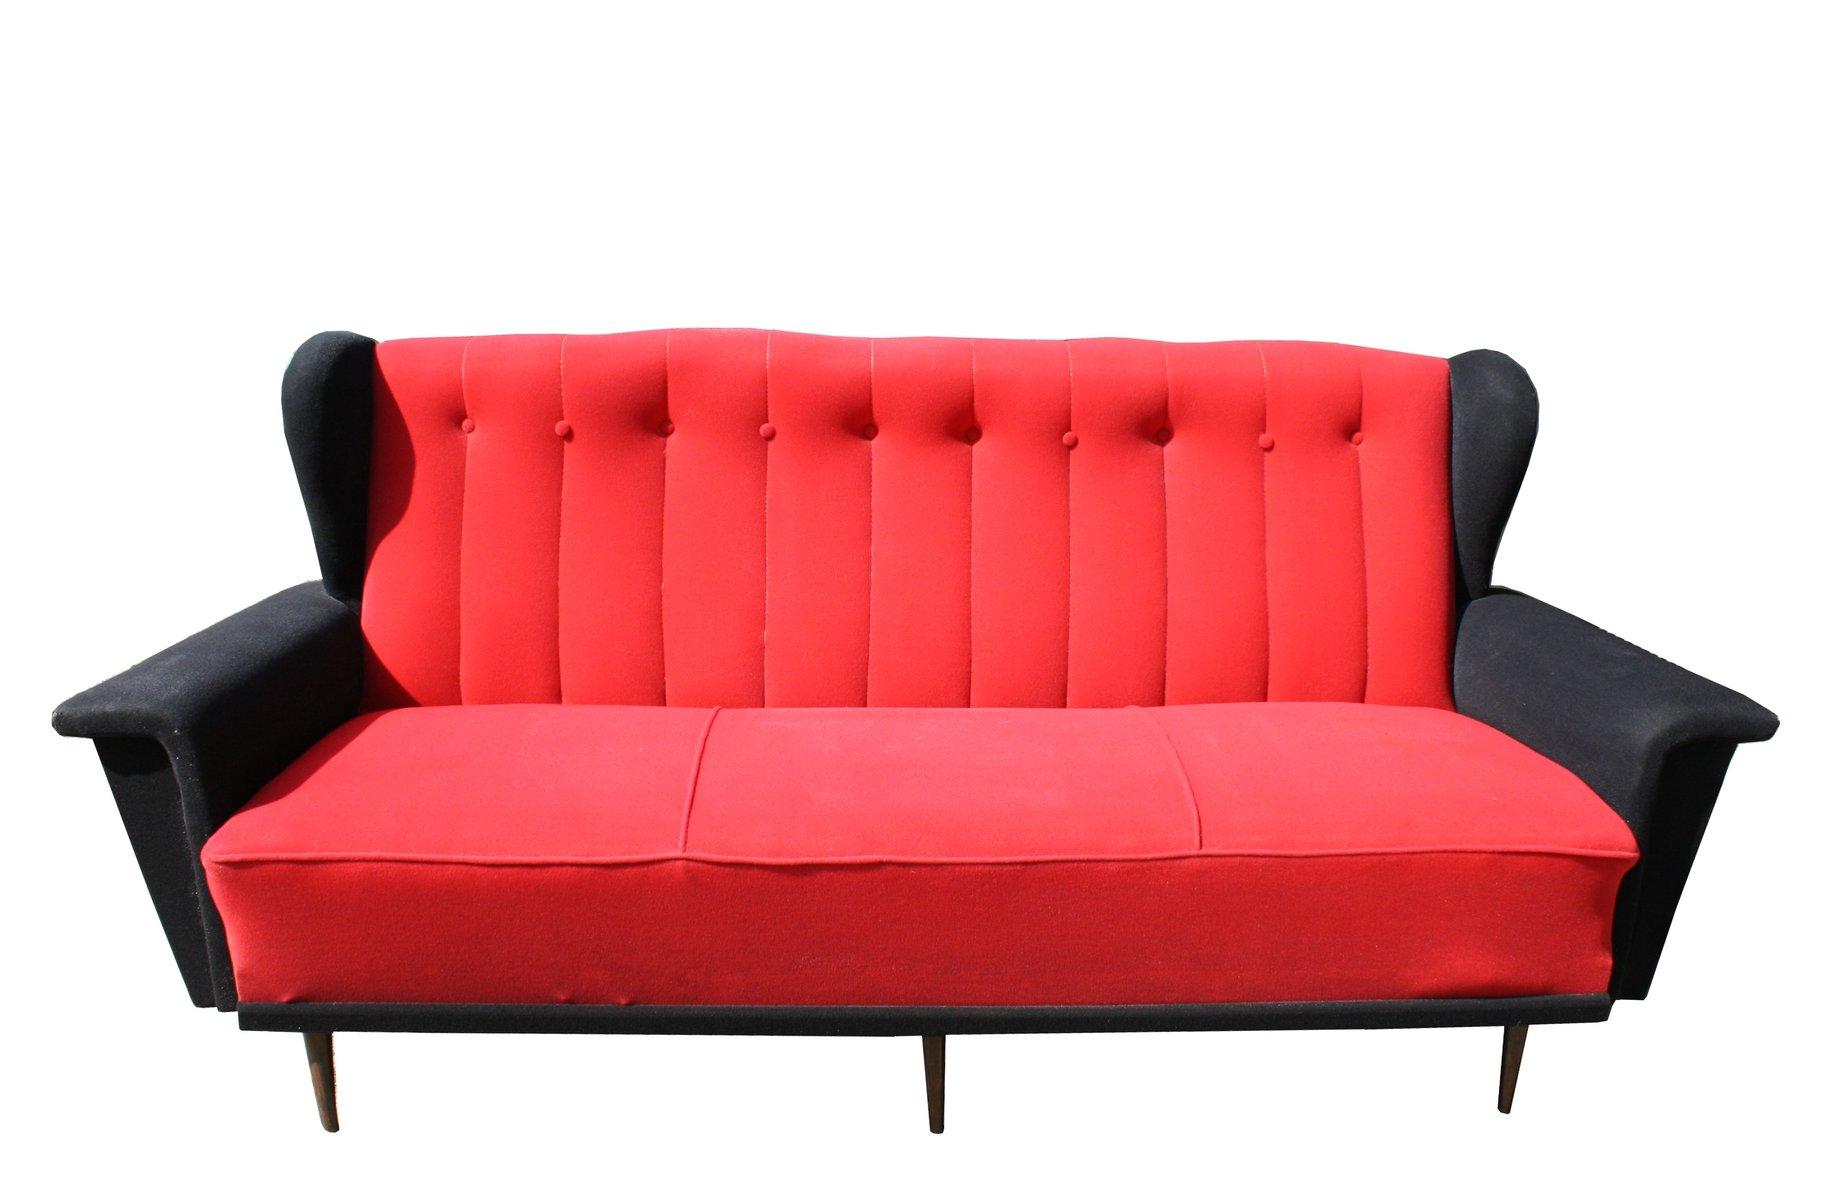 Vintage red black sofa 1950s for sale at pamono for Vintage sectional sofa craigslist